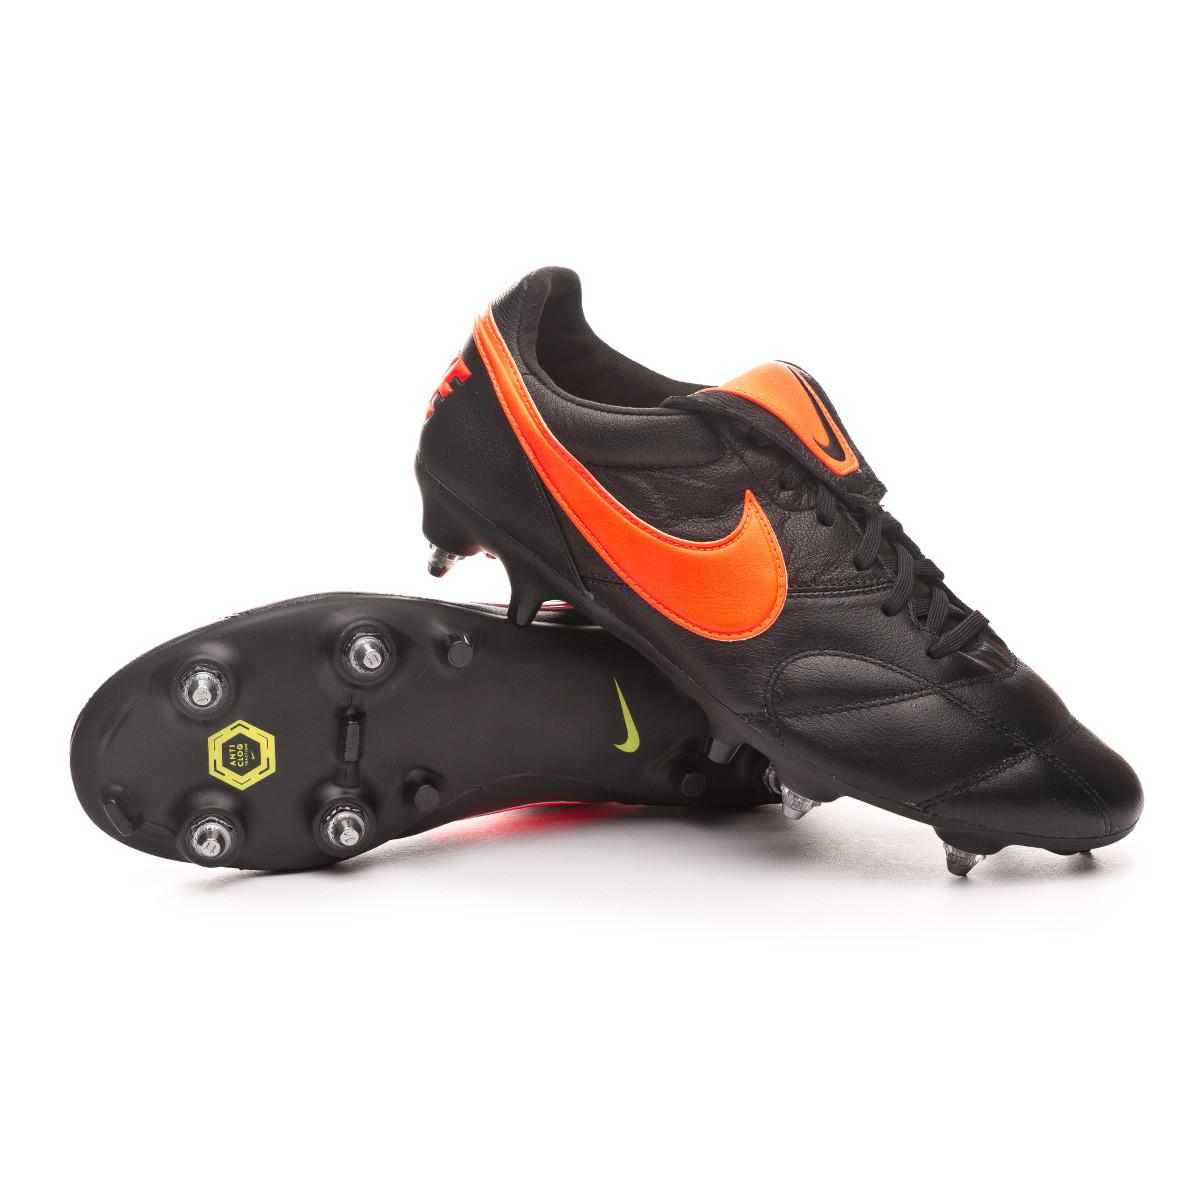 Correo Entrada Polar  Football Boots Nike Tiempo Premier II SG-PRO Anti-Clog Traction Black-Hyper  crimson-Black - Football store Fútbol Emotion